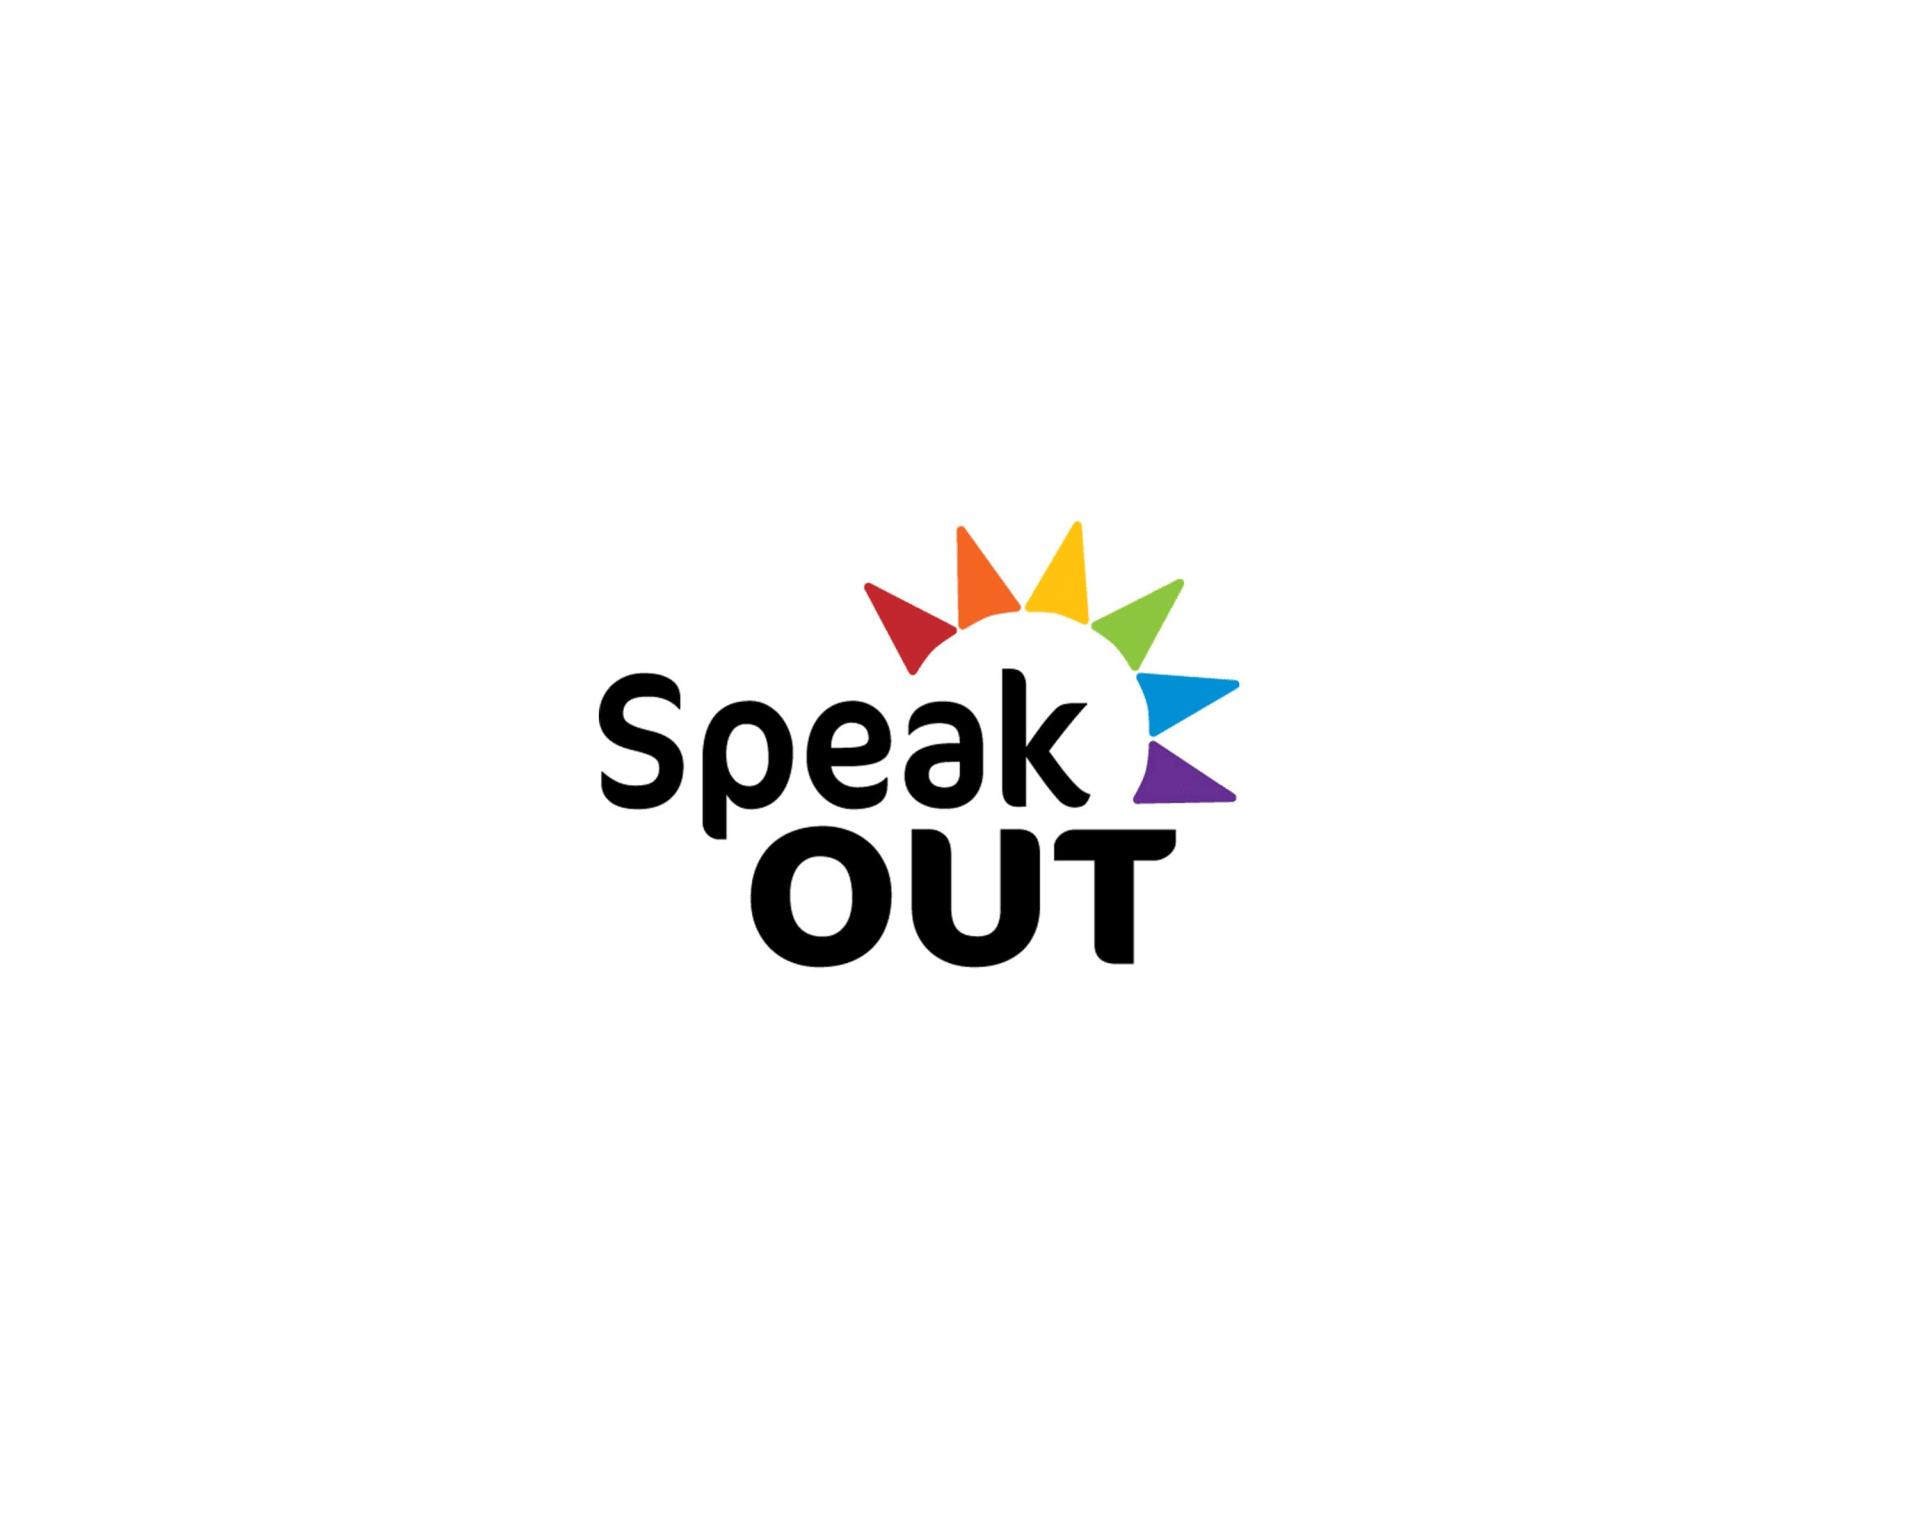 Speakout image